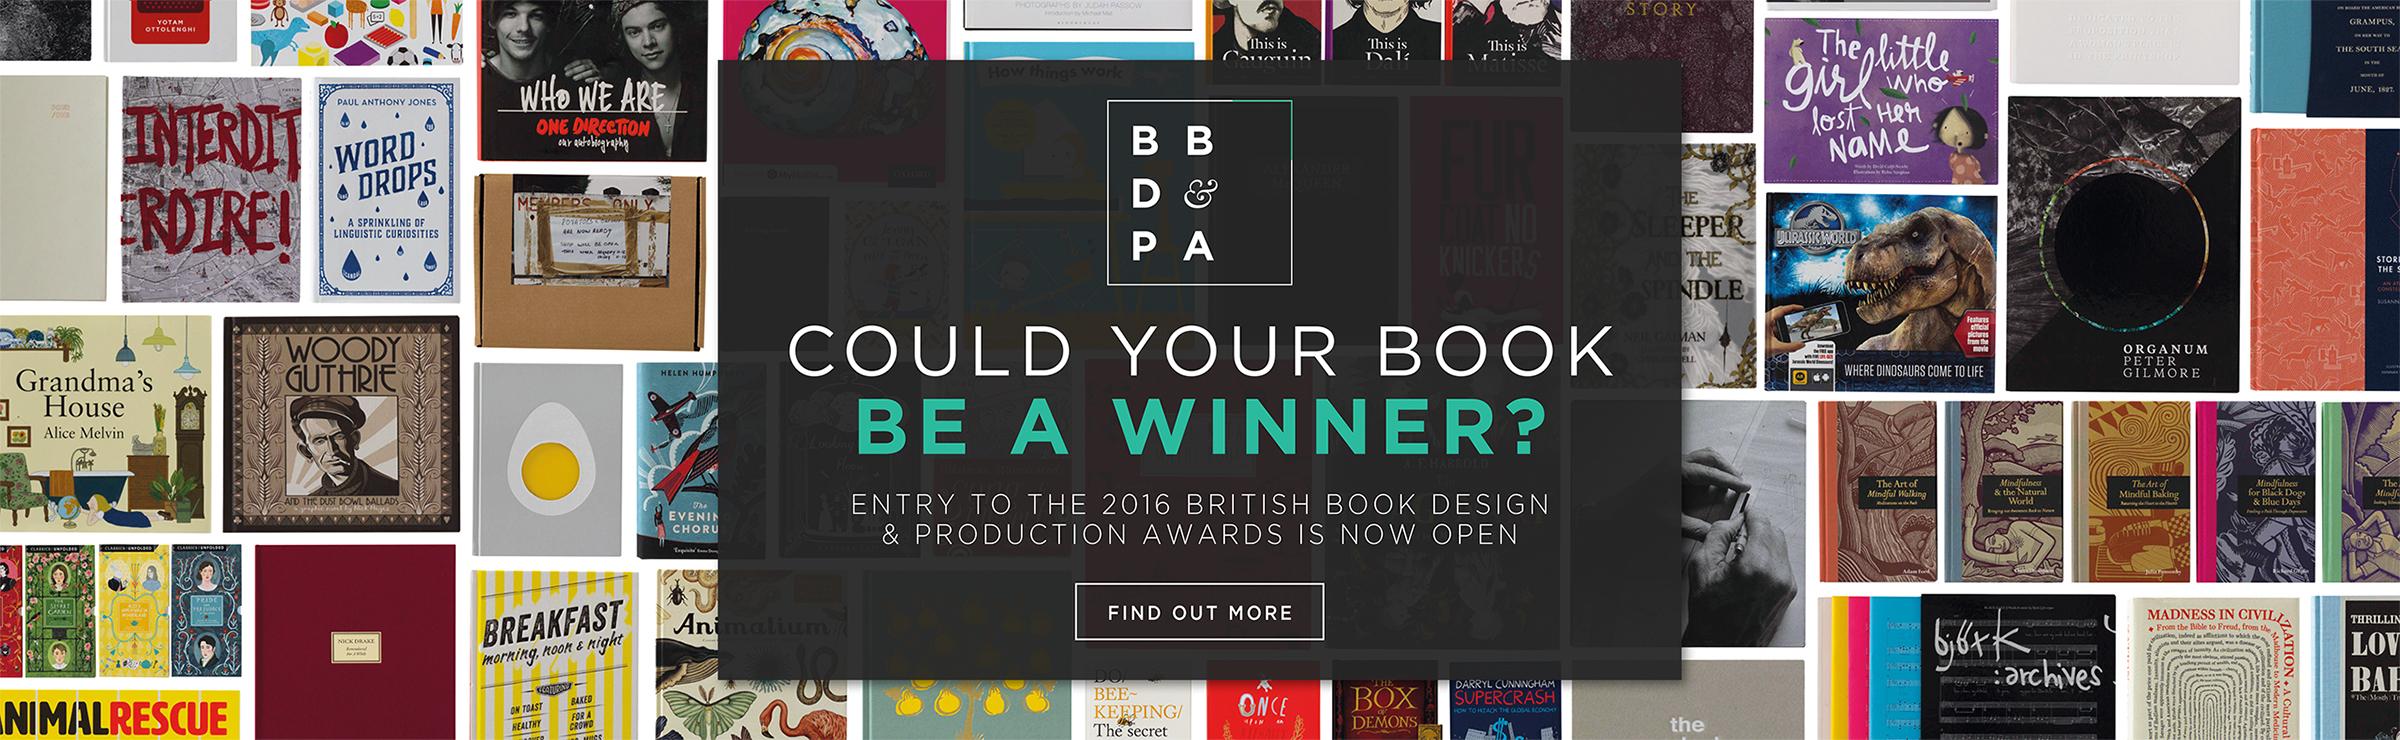 British Book Design and Awards 2016